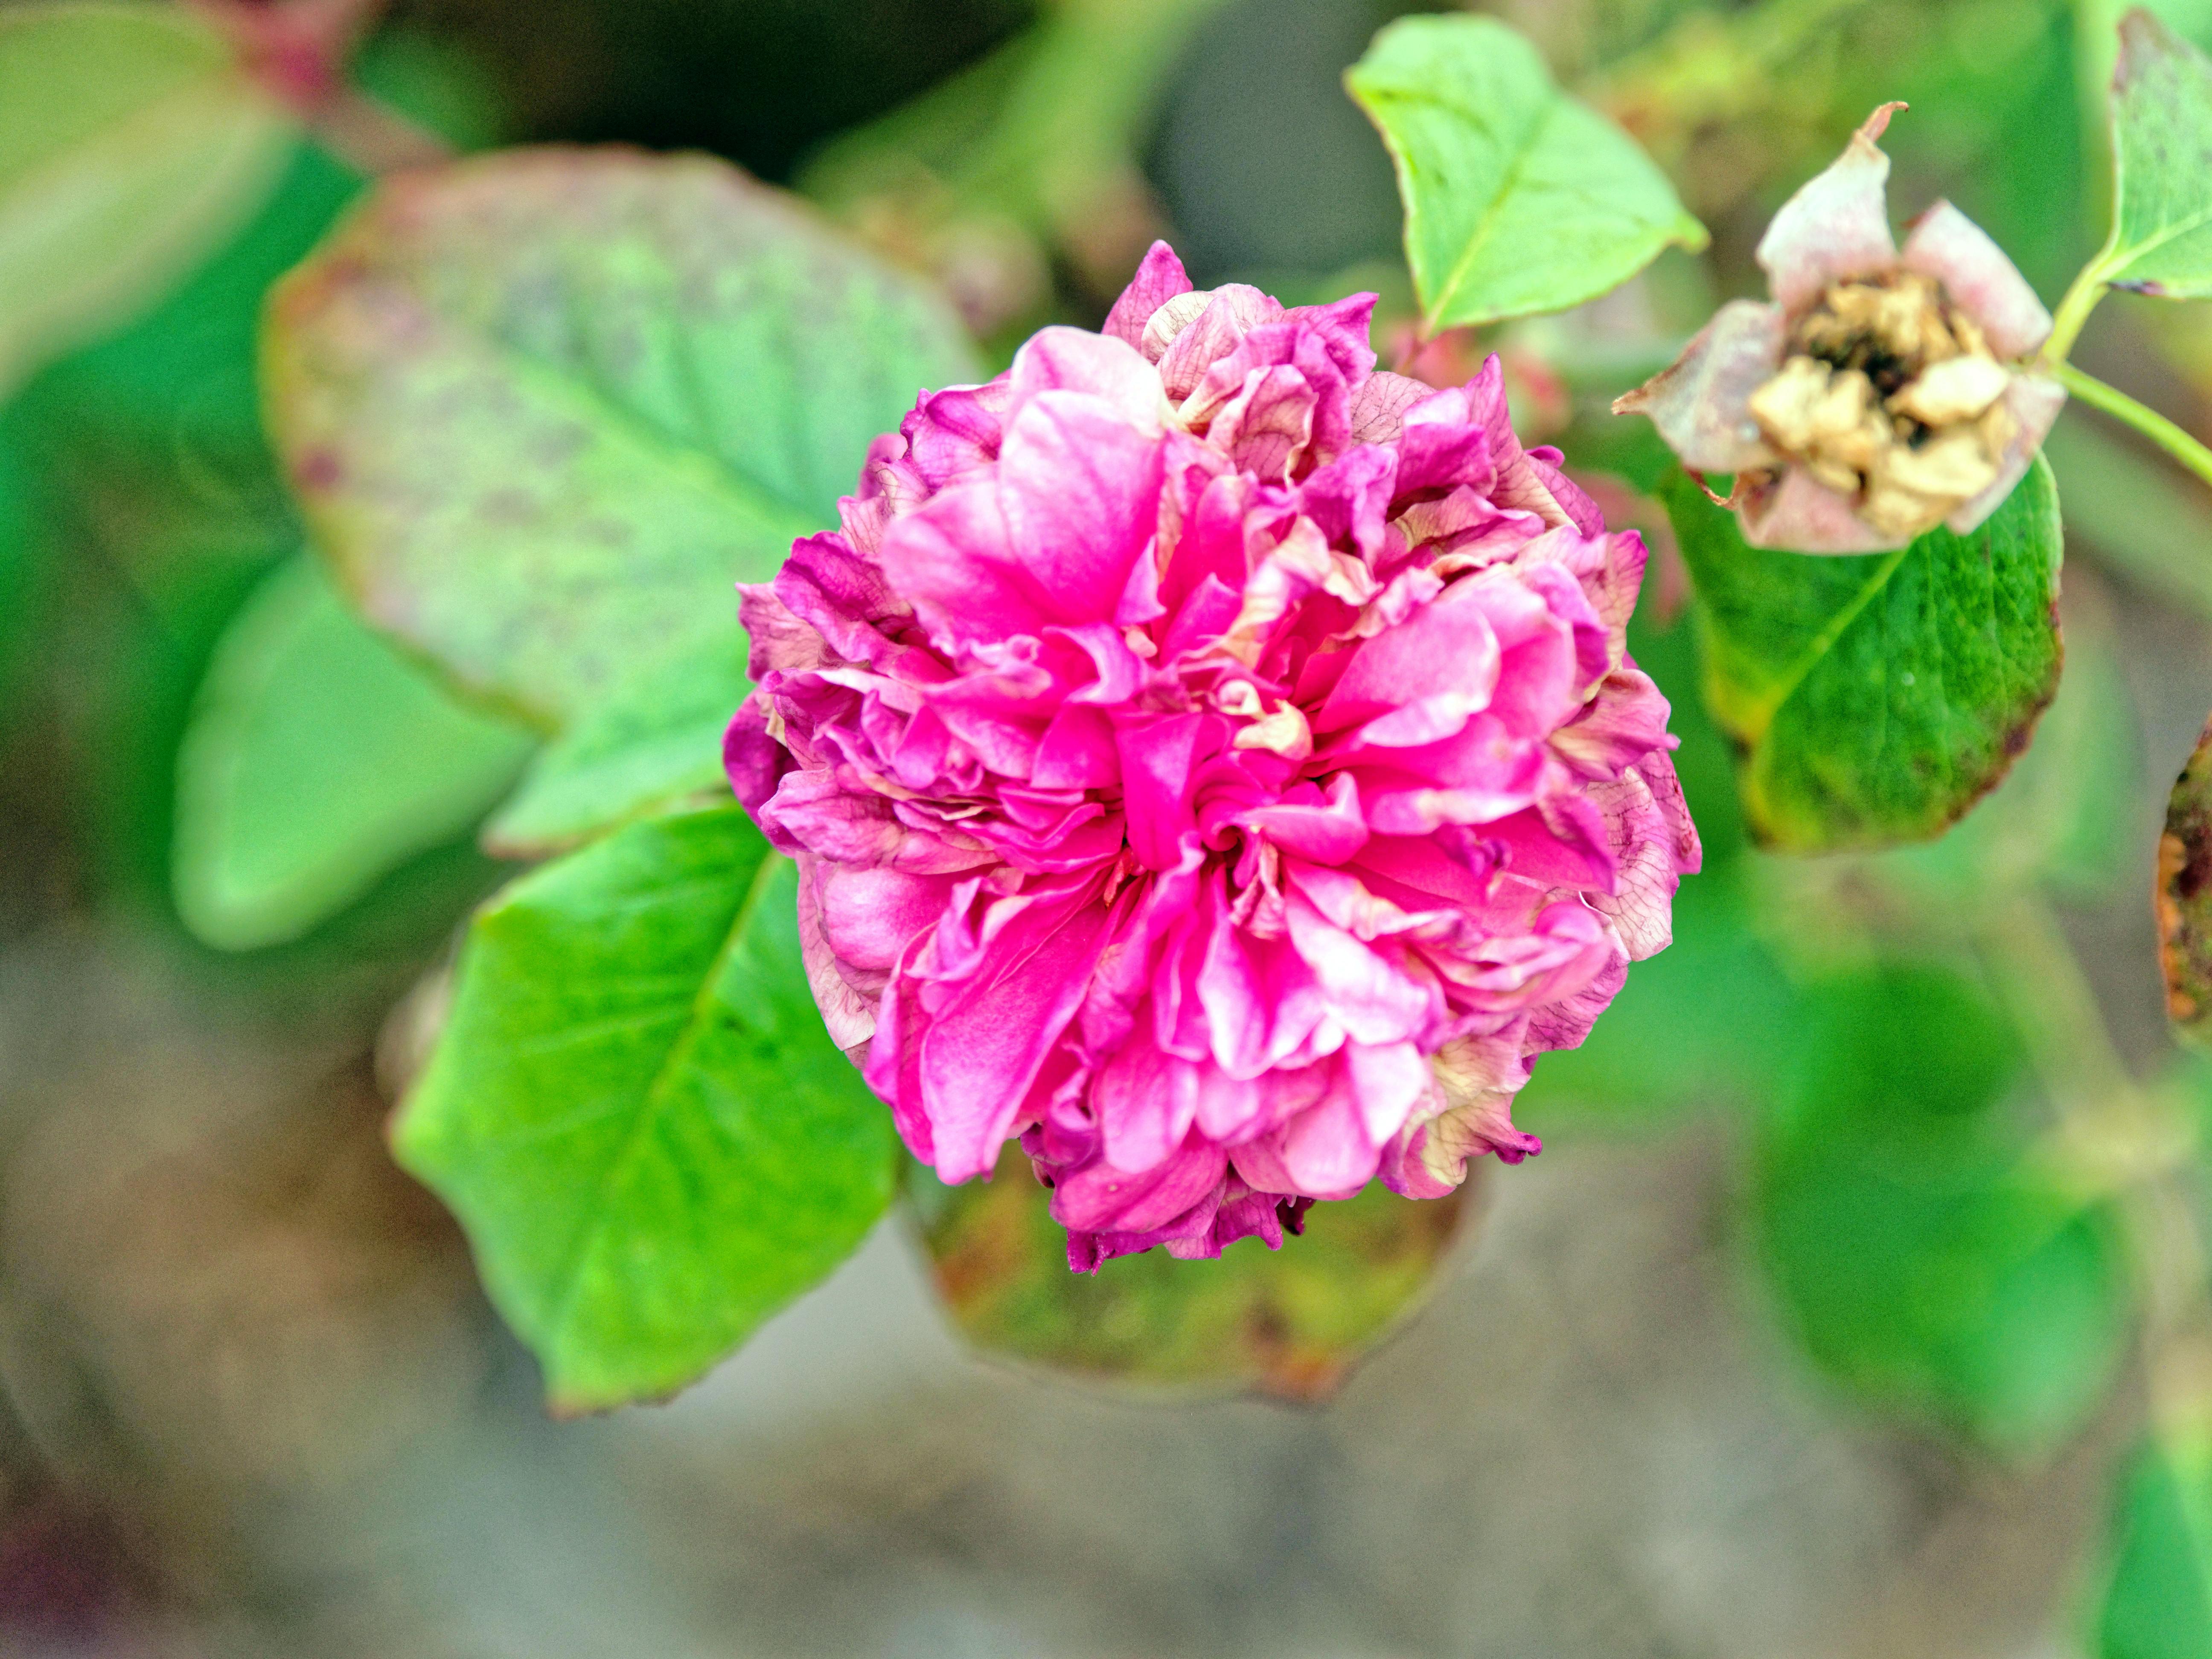 Roses-19.jpeg